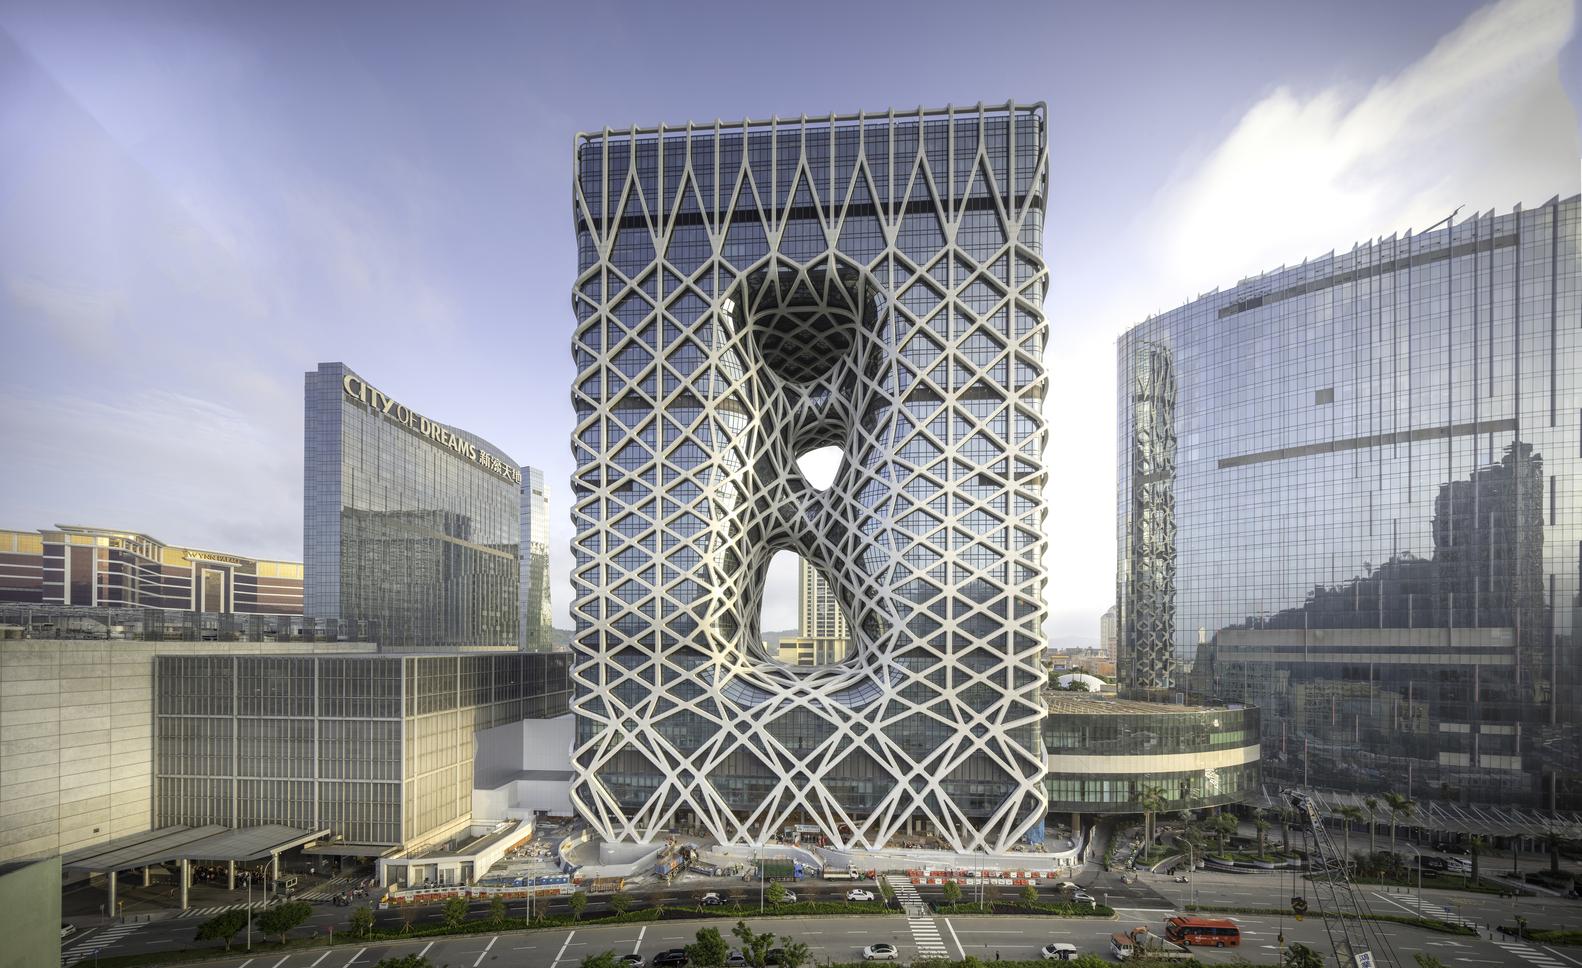 Morpheus Hotel / Zaha Hadid Architects